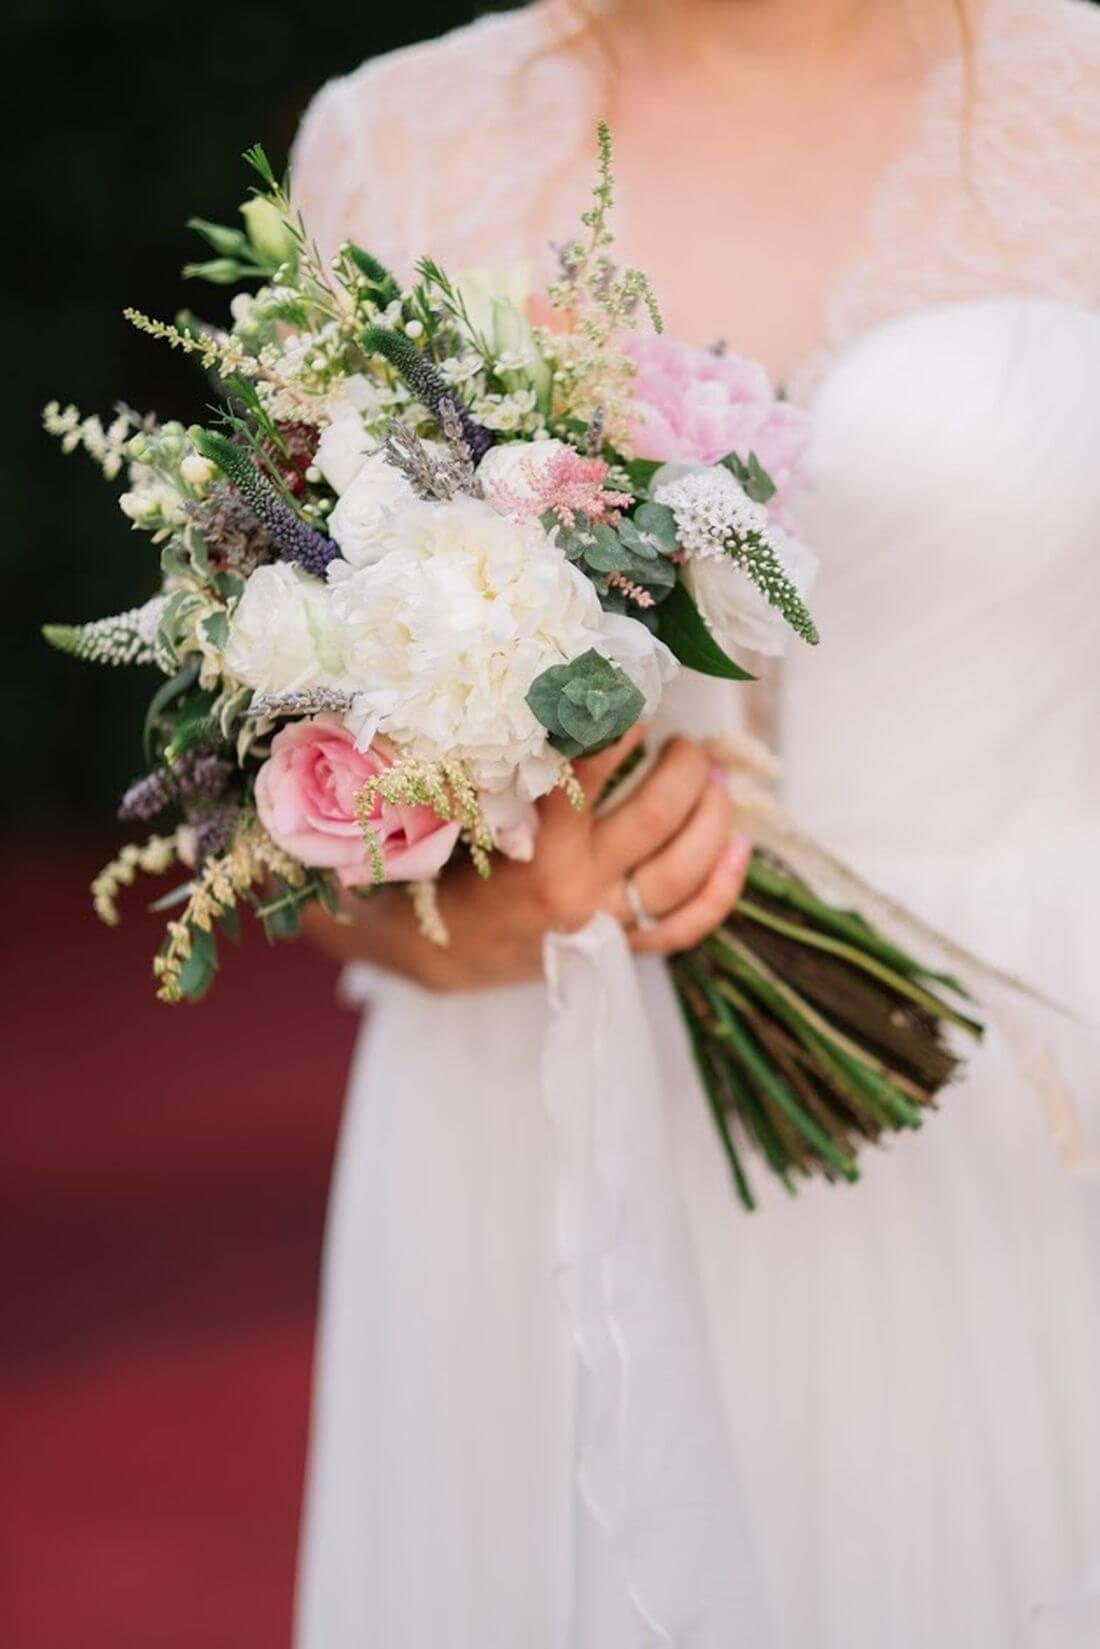 Nunta cu artificii, lavanda si muzica – Adelina si Ionut-IDO-Weddings-nuntiinaerliber (25)